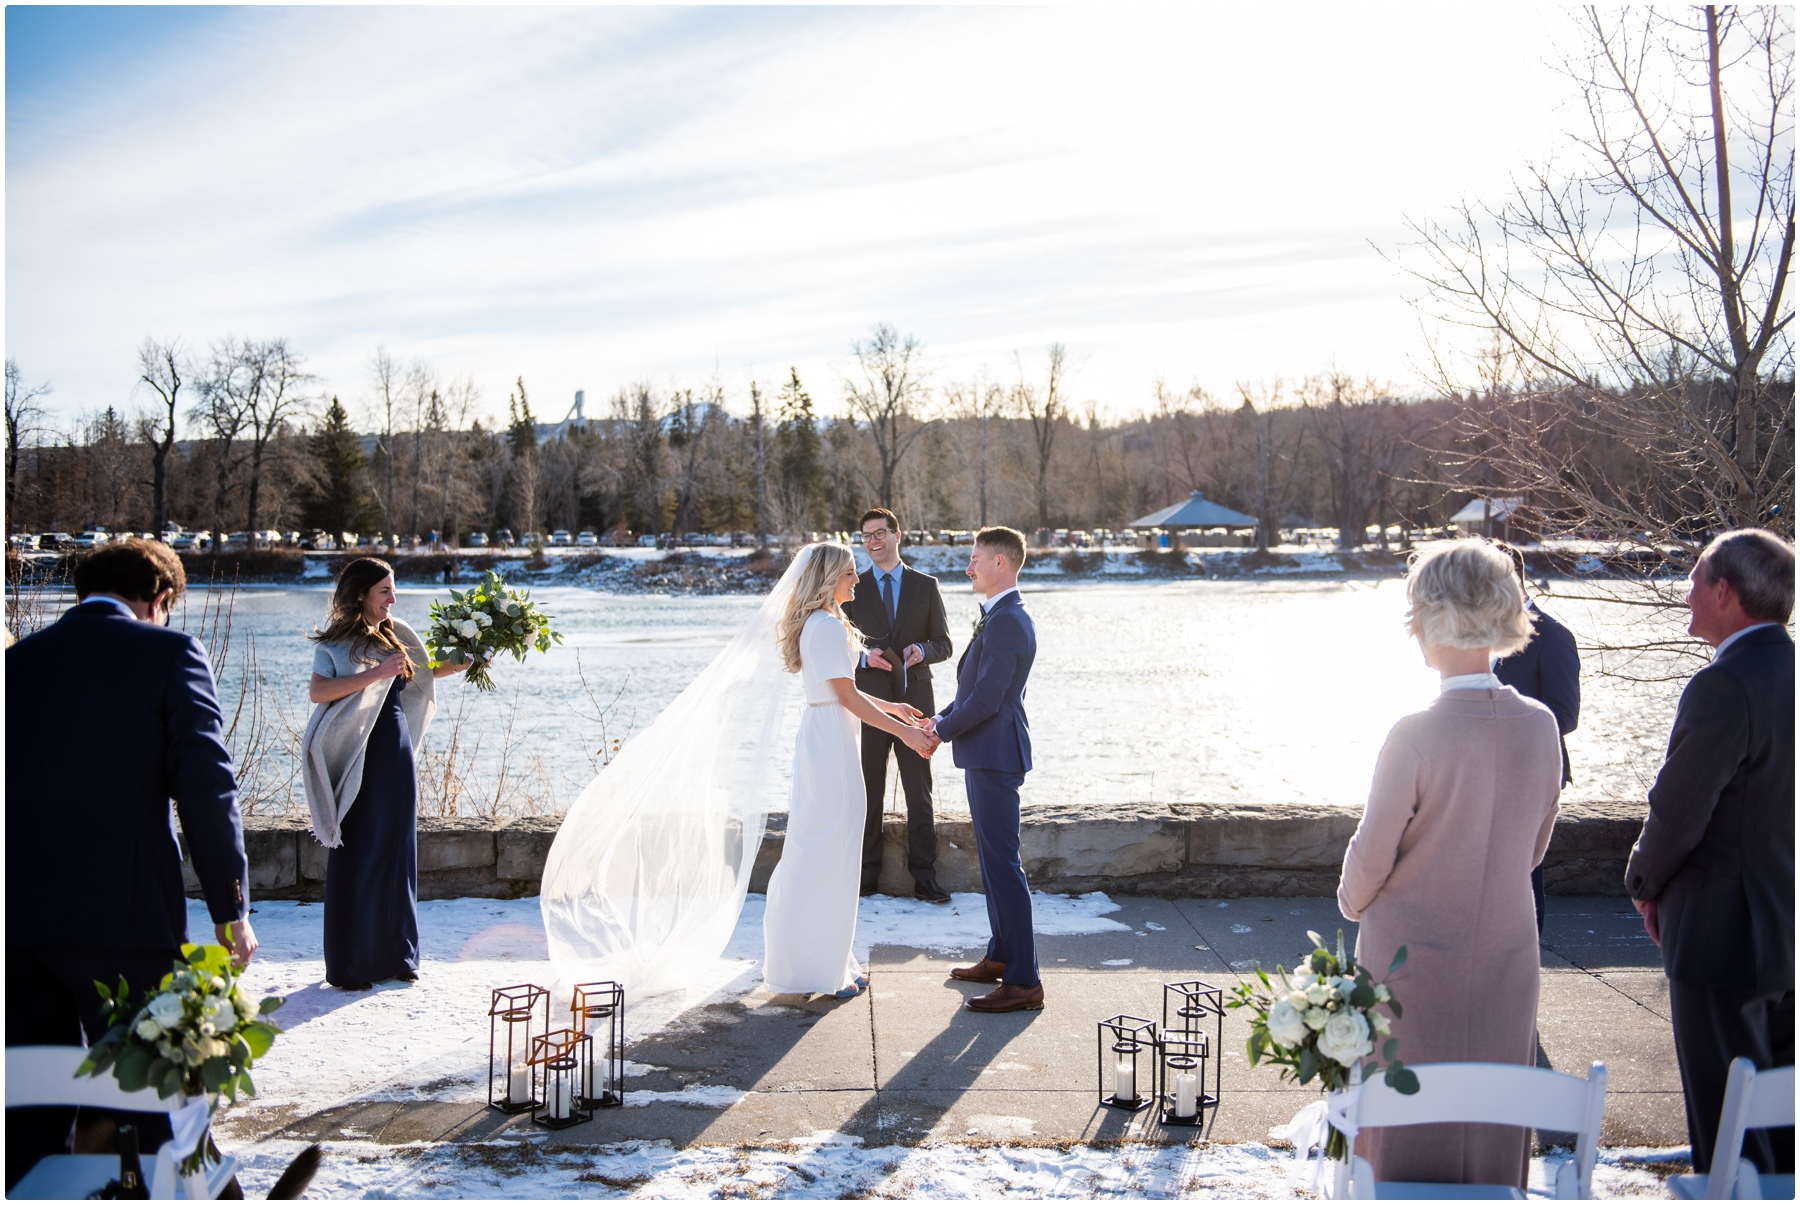 Outdoor Winter Wedding Ceremony Calgary